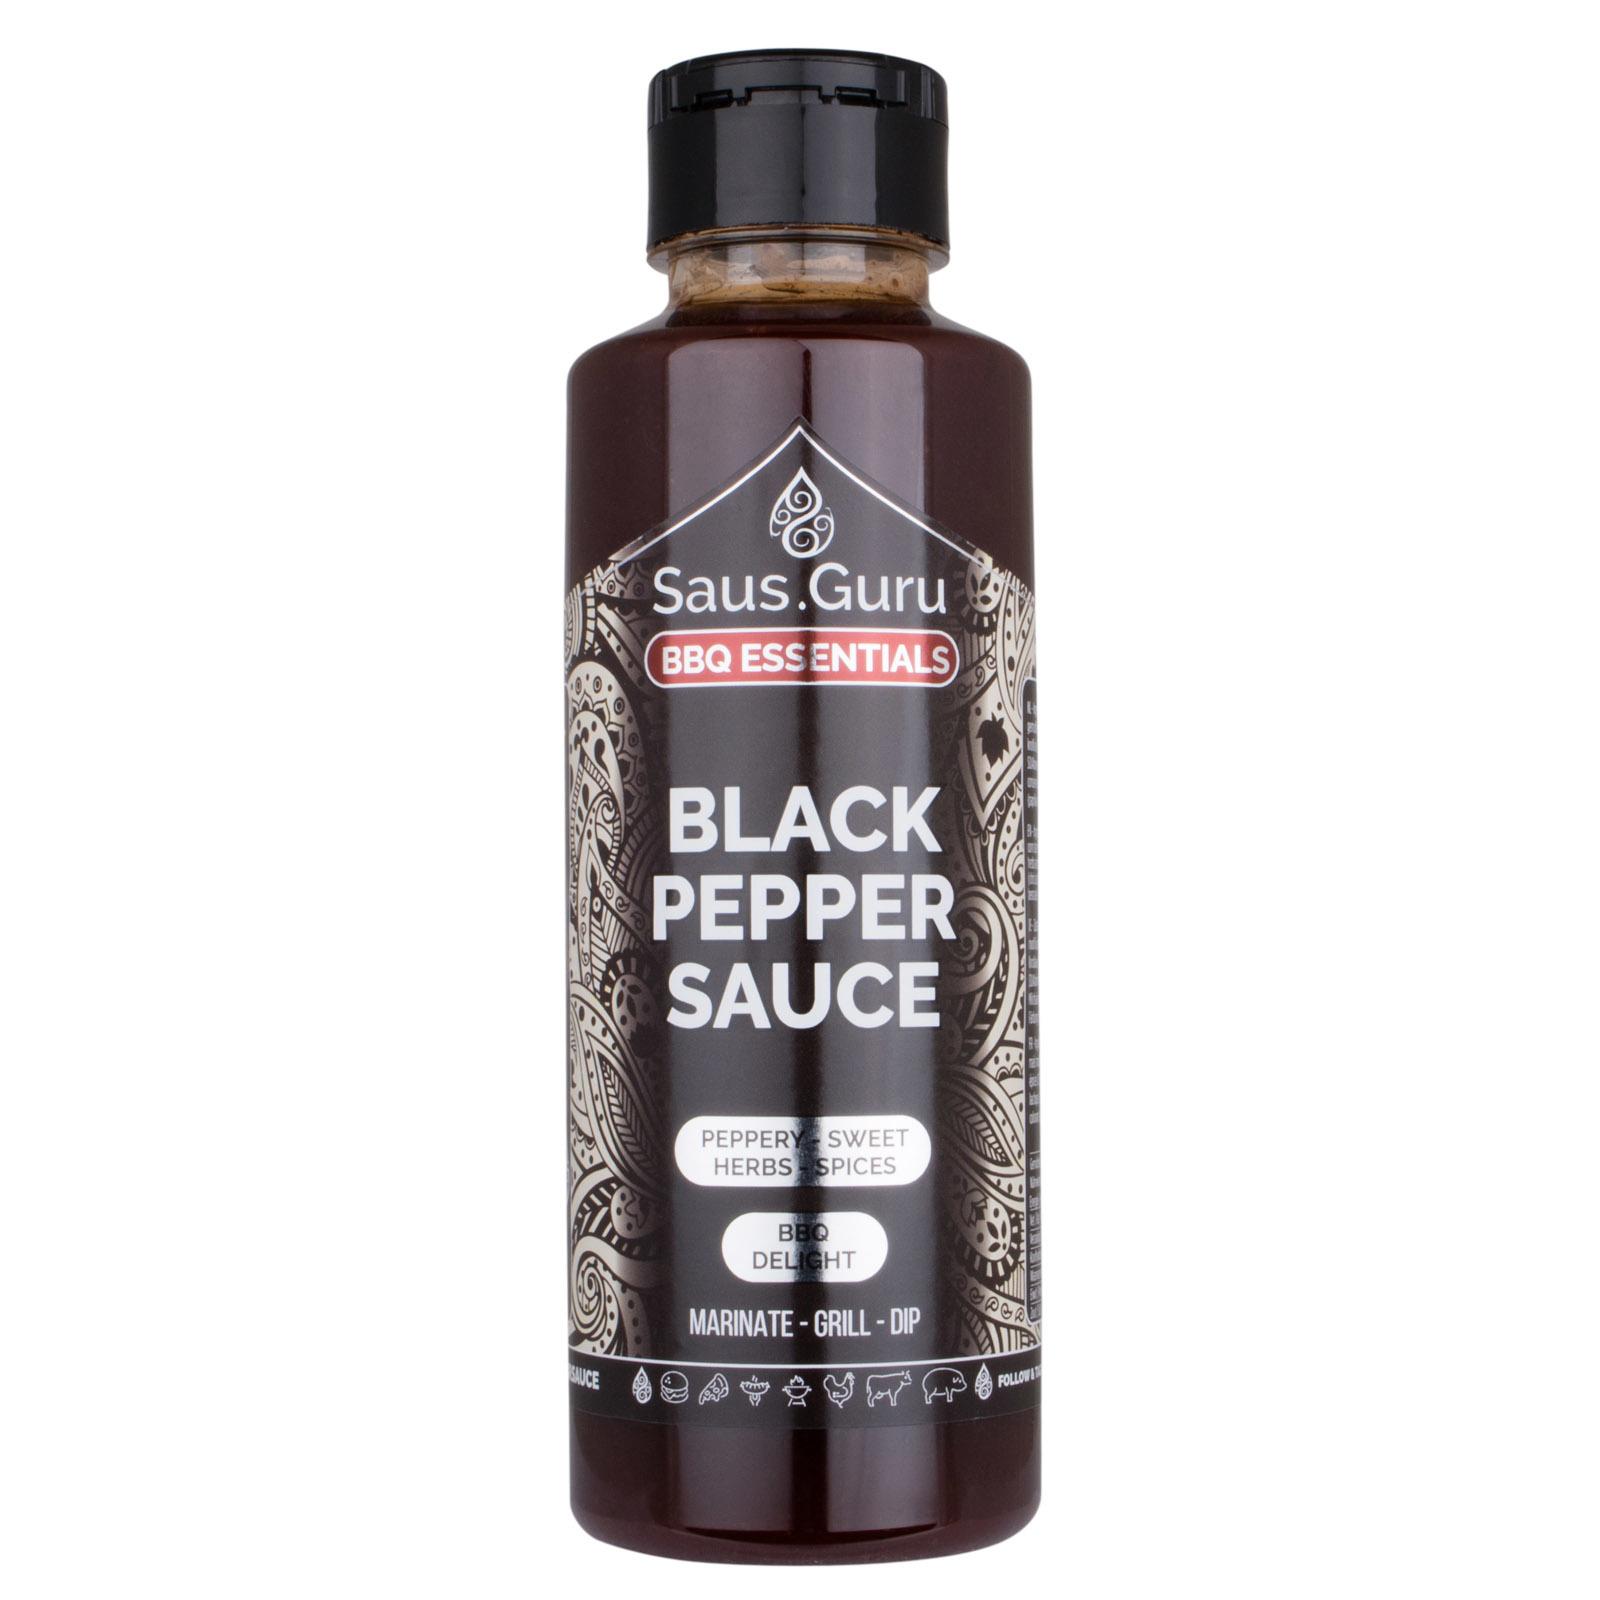 Saus.Guru's Black Pepper BBQ Sauce-2